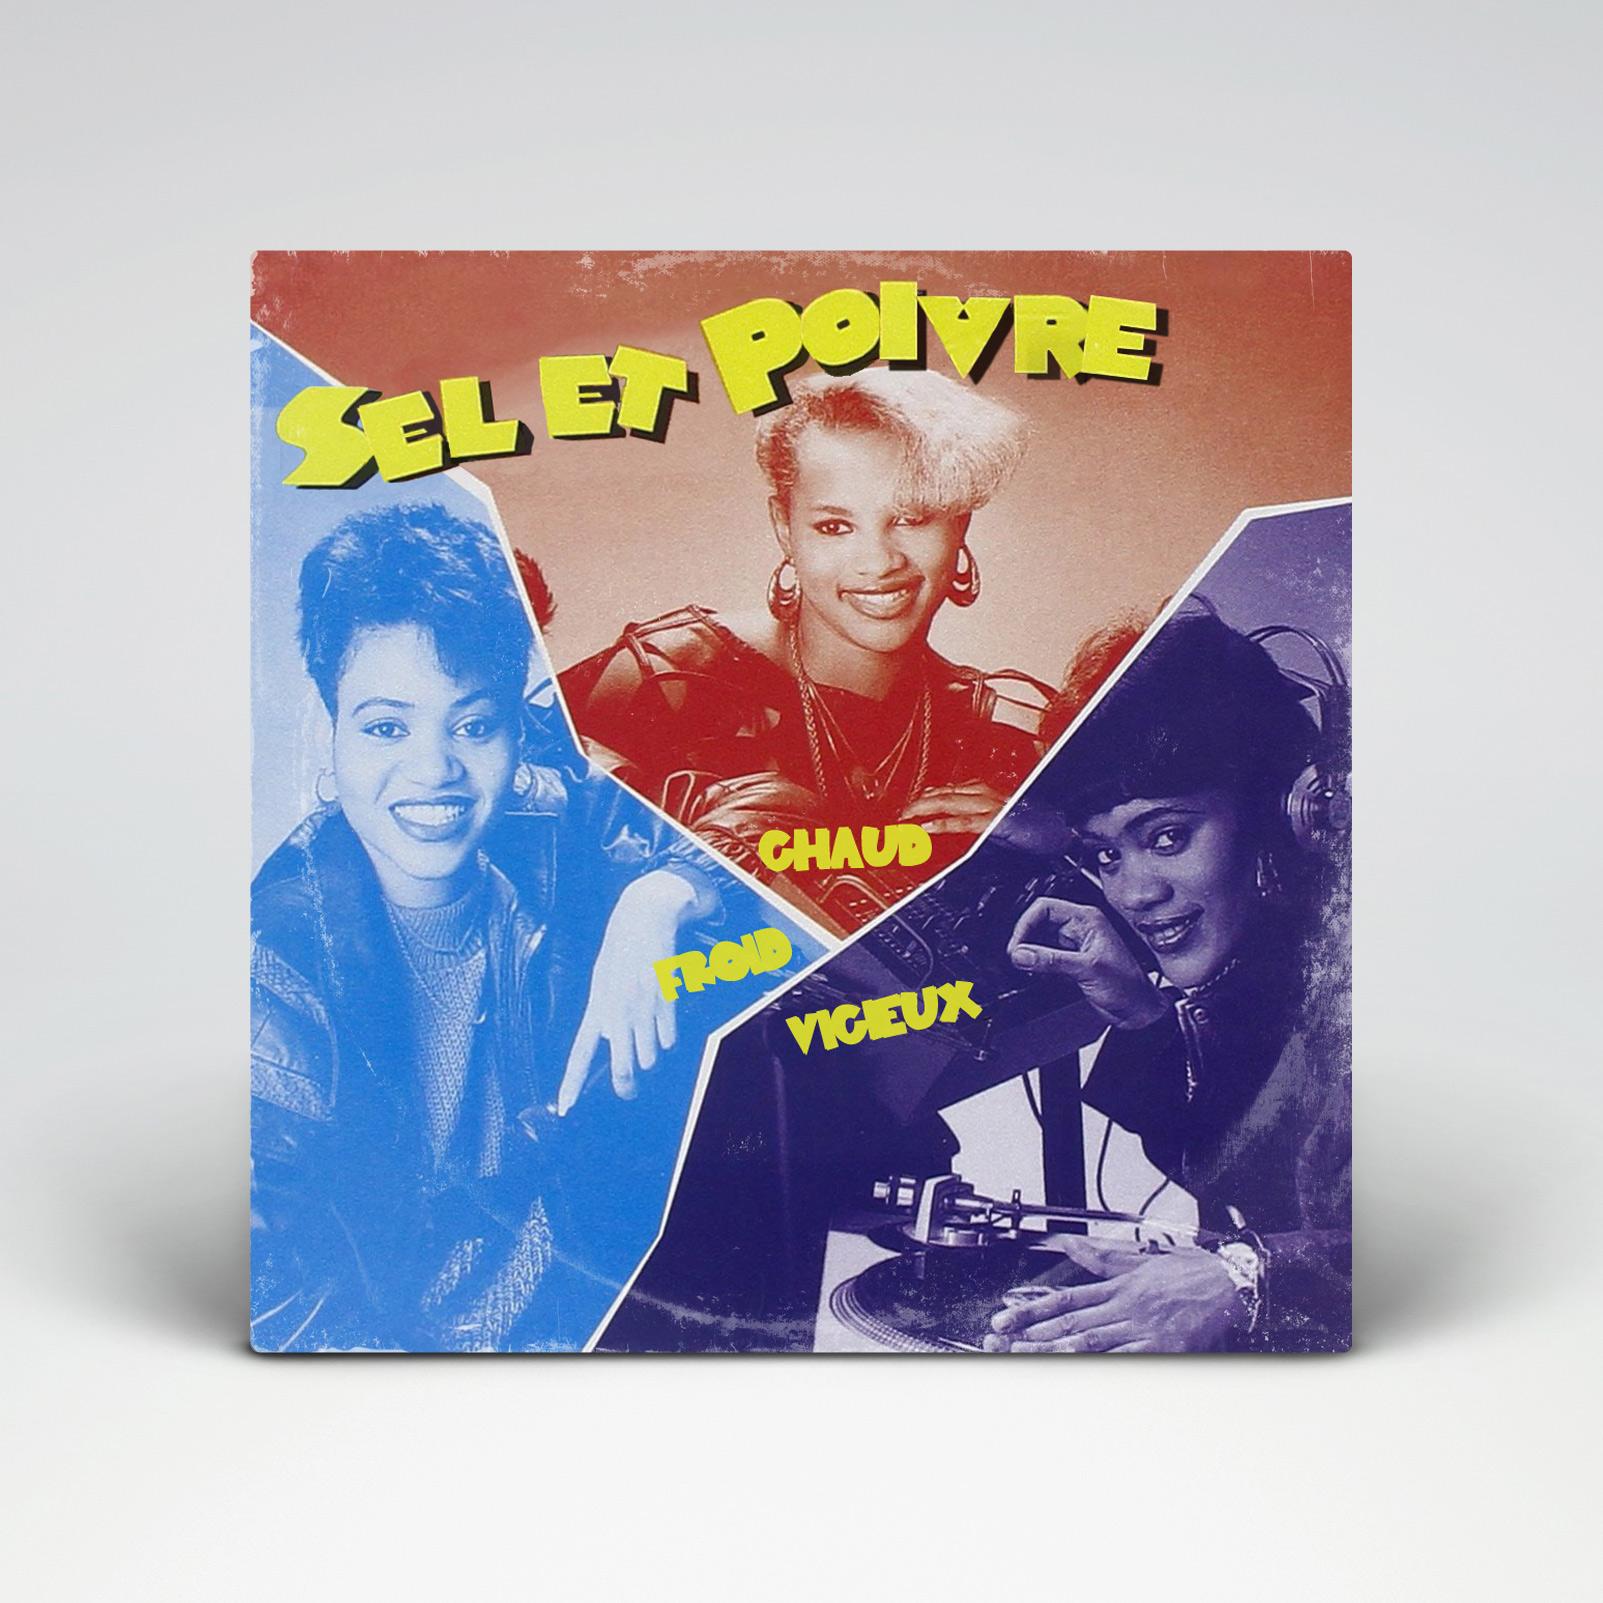 Salt-N-Pepa - Hot, Cool &Vicious (1986)